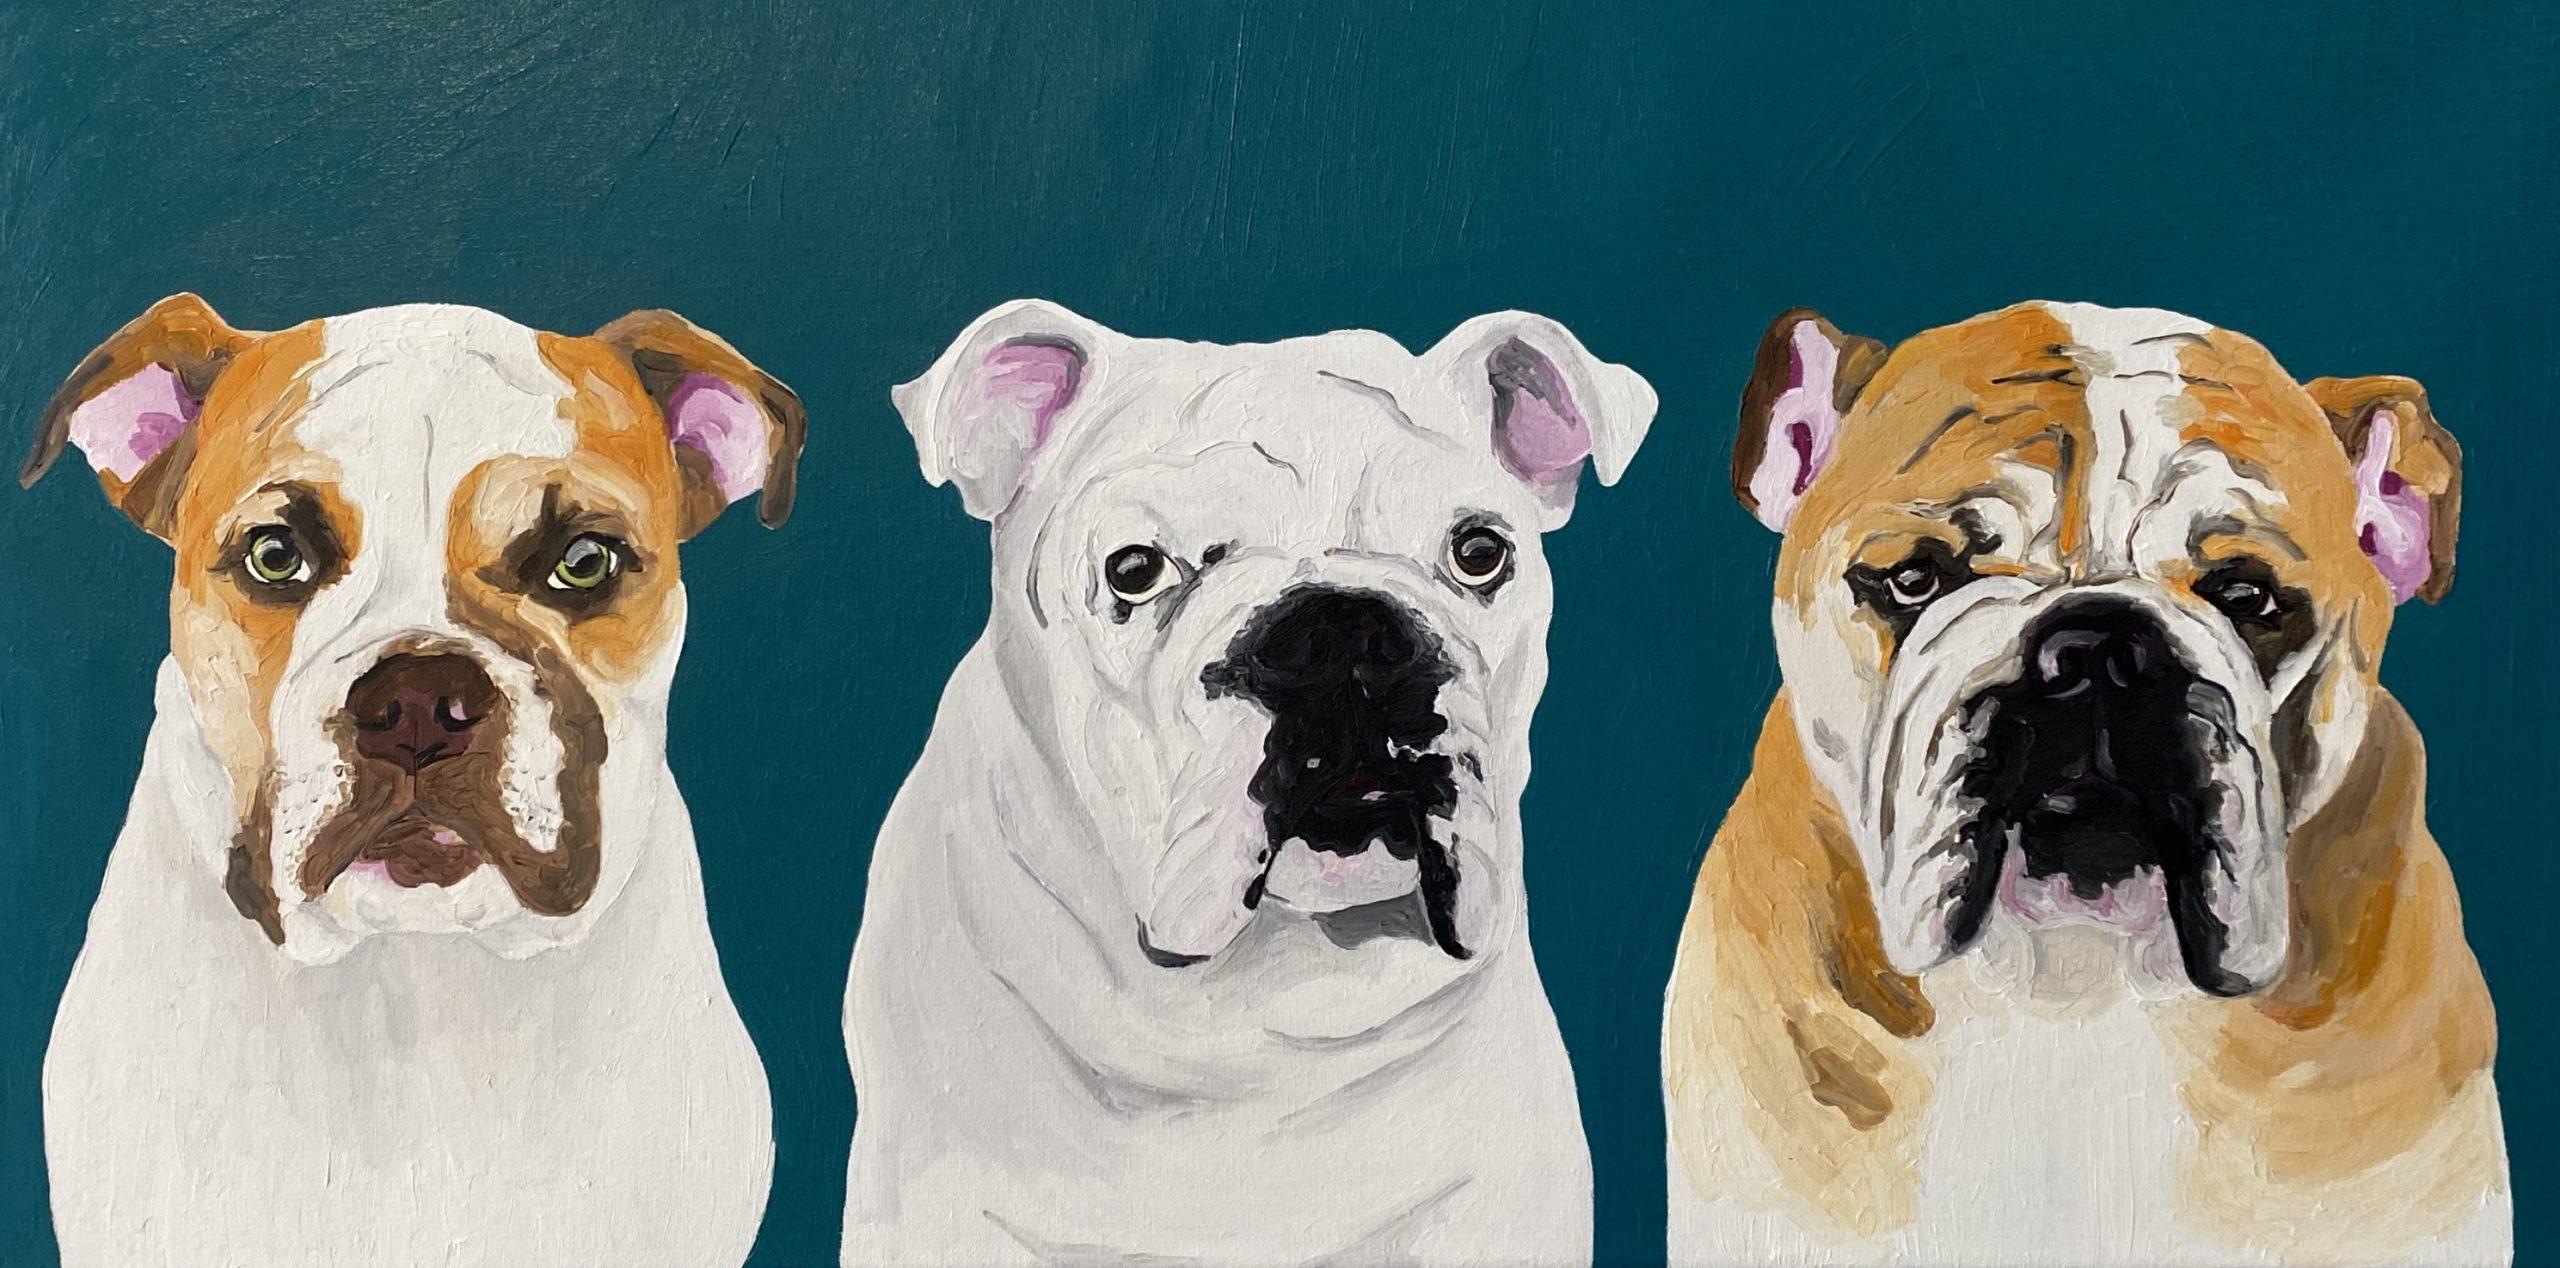 A Guide To Make Custom Pet Portraits